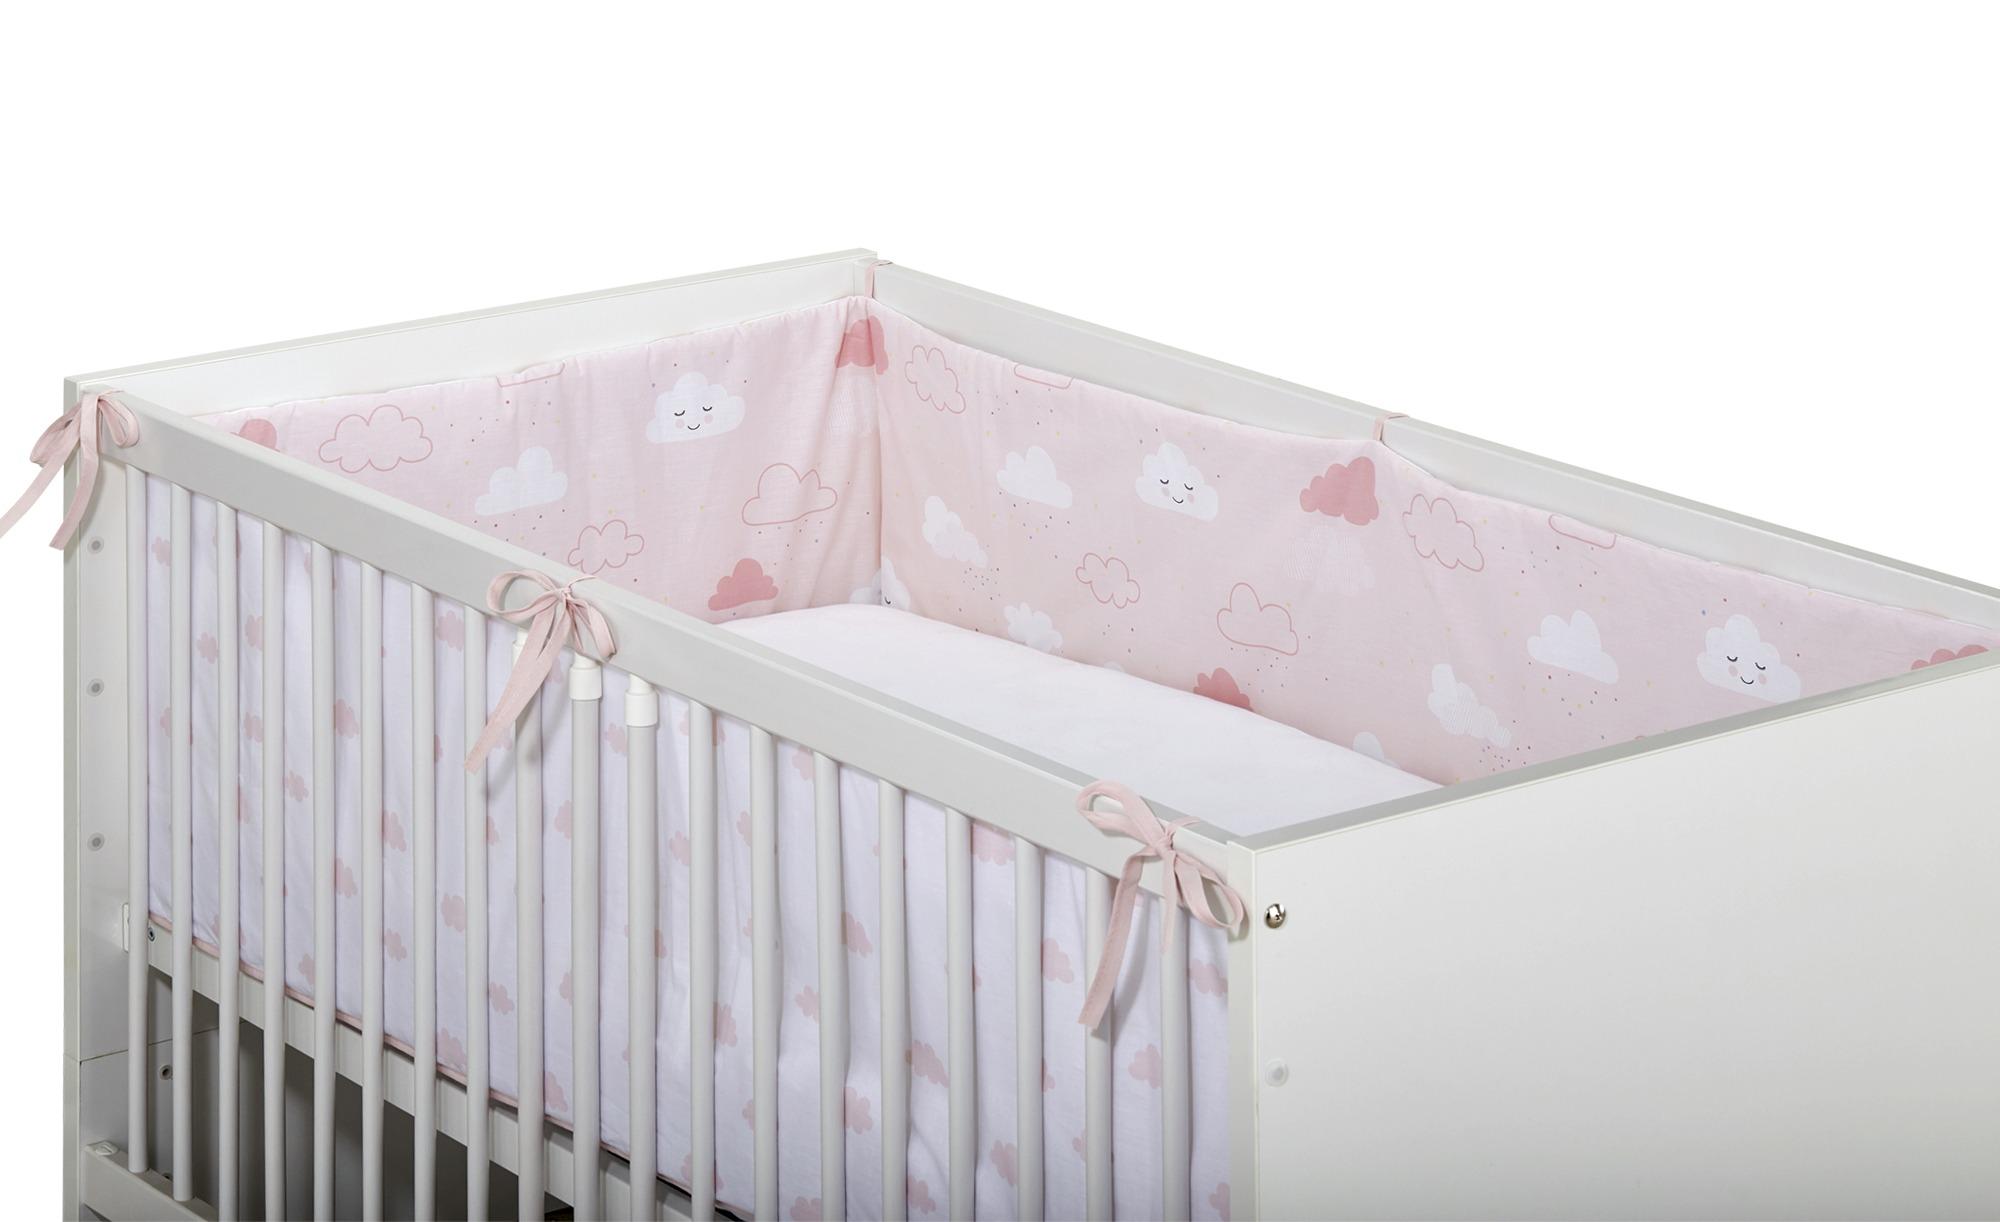 Nestchen für Gitterbett